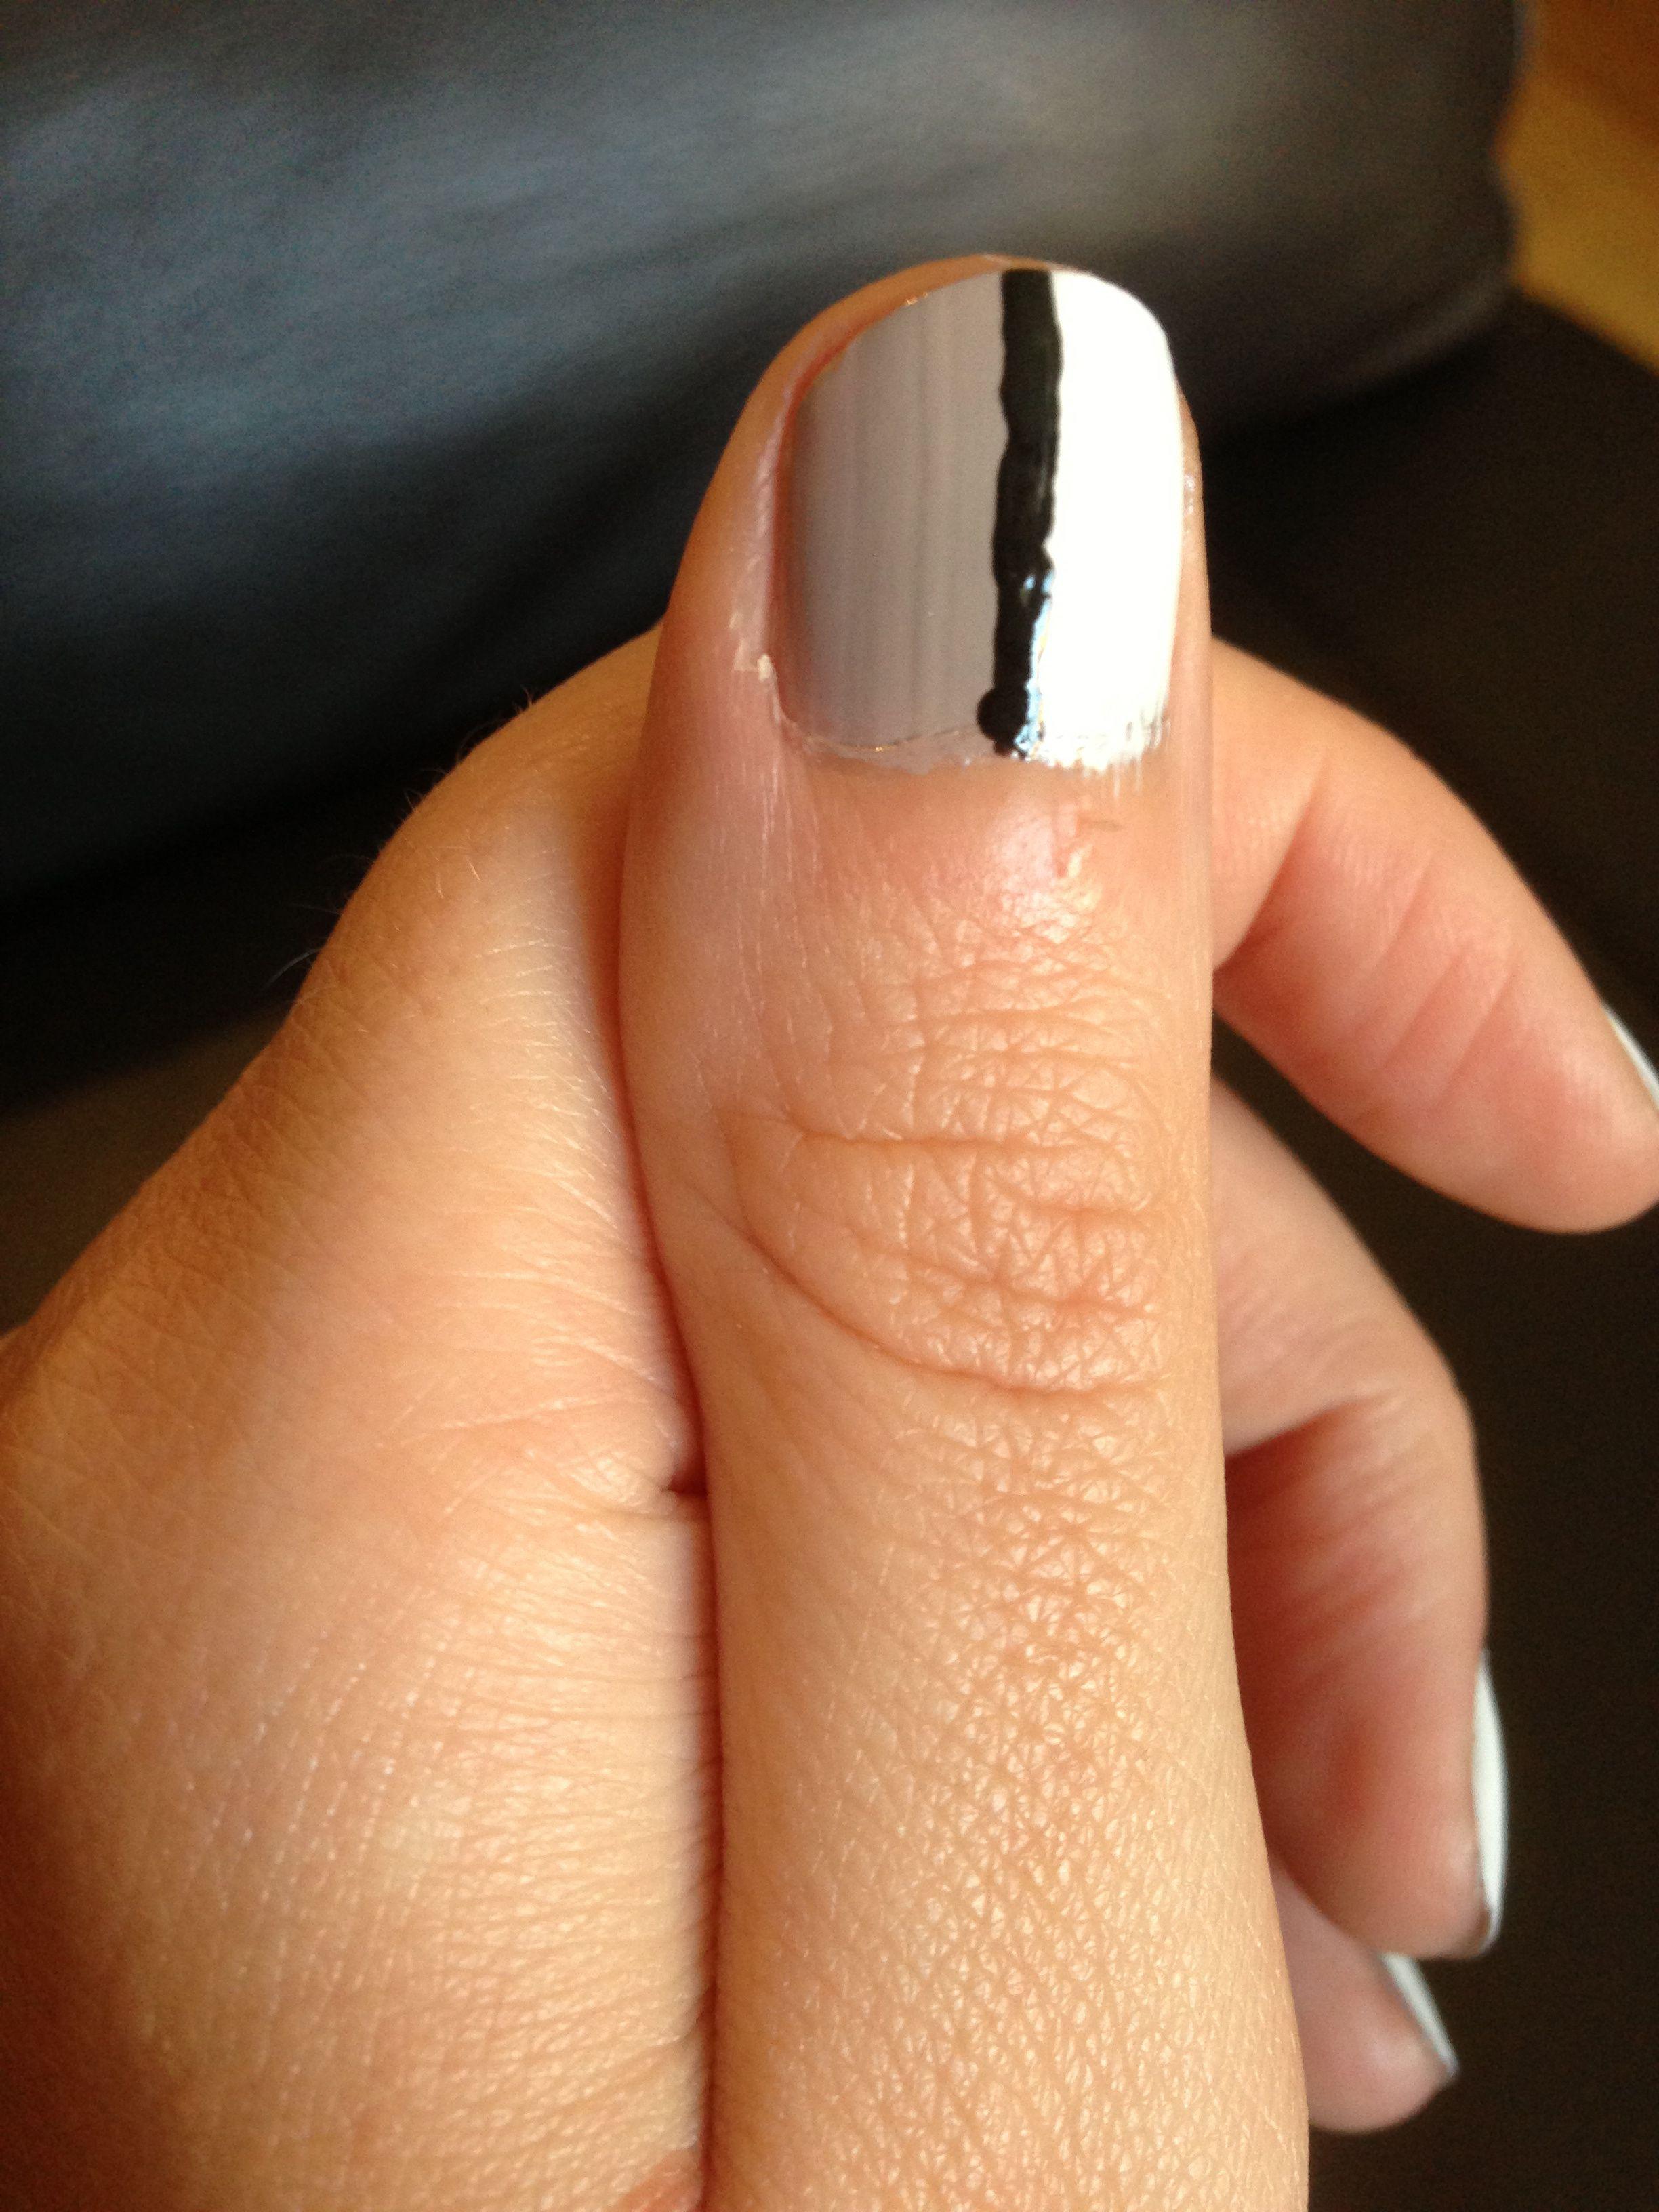 22 Luxury Nail Designs Jewels Monochrome Nail Art Pens English Rose From Manchester Blog 2448x3264 Black Gems Na Luxury Nails Classy Nail Art Ideas Gem Nails